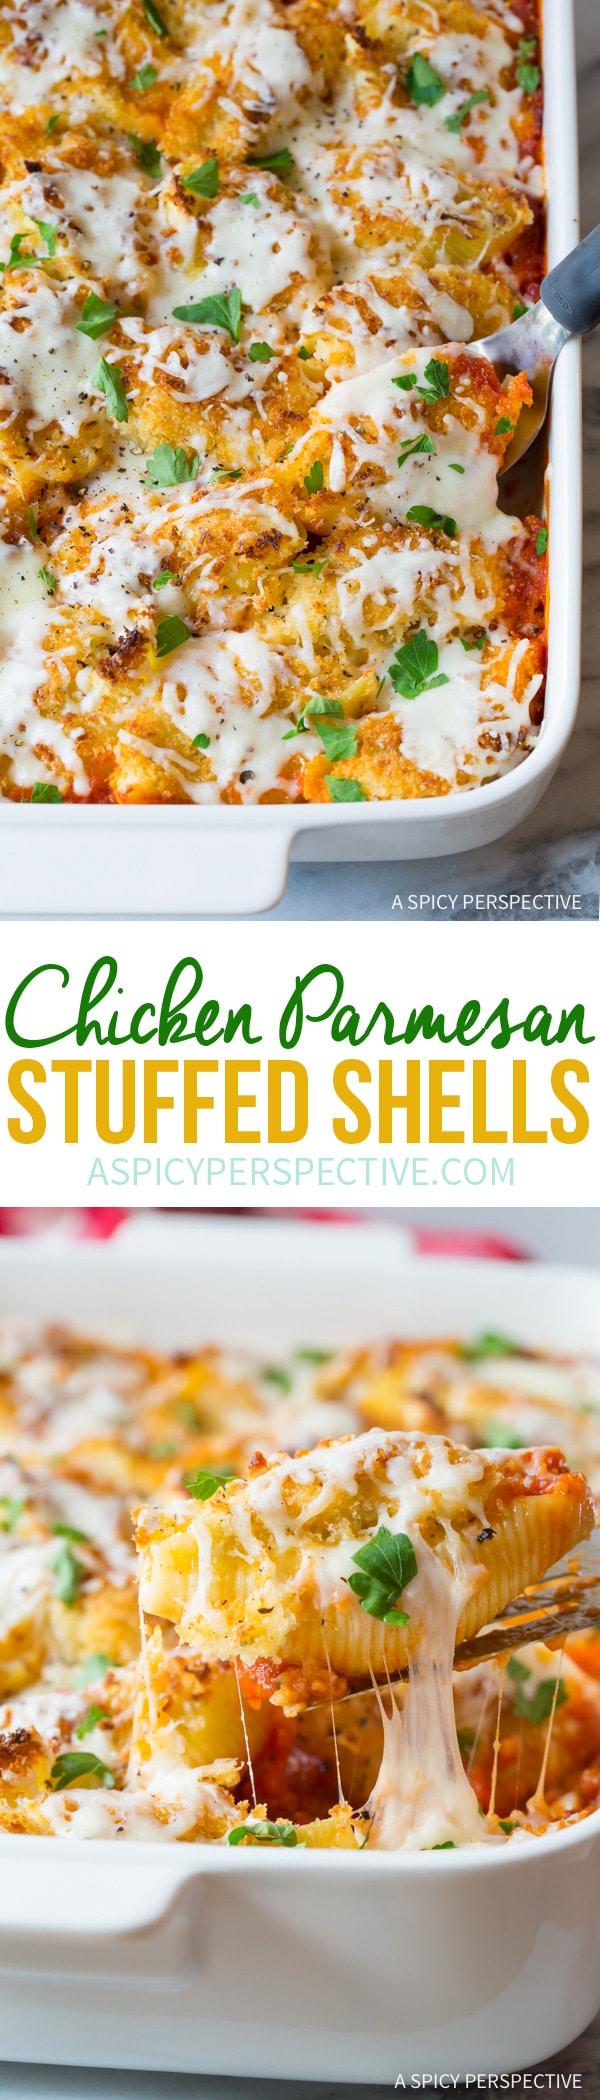 Perfect Chicken Parmesan Stuffed Shells Recipe